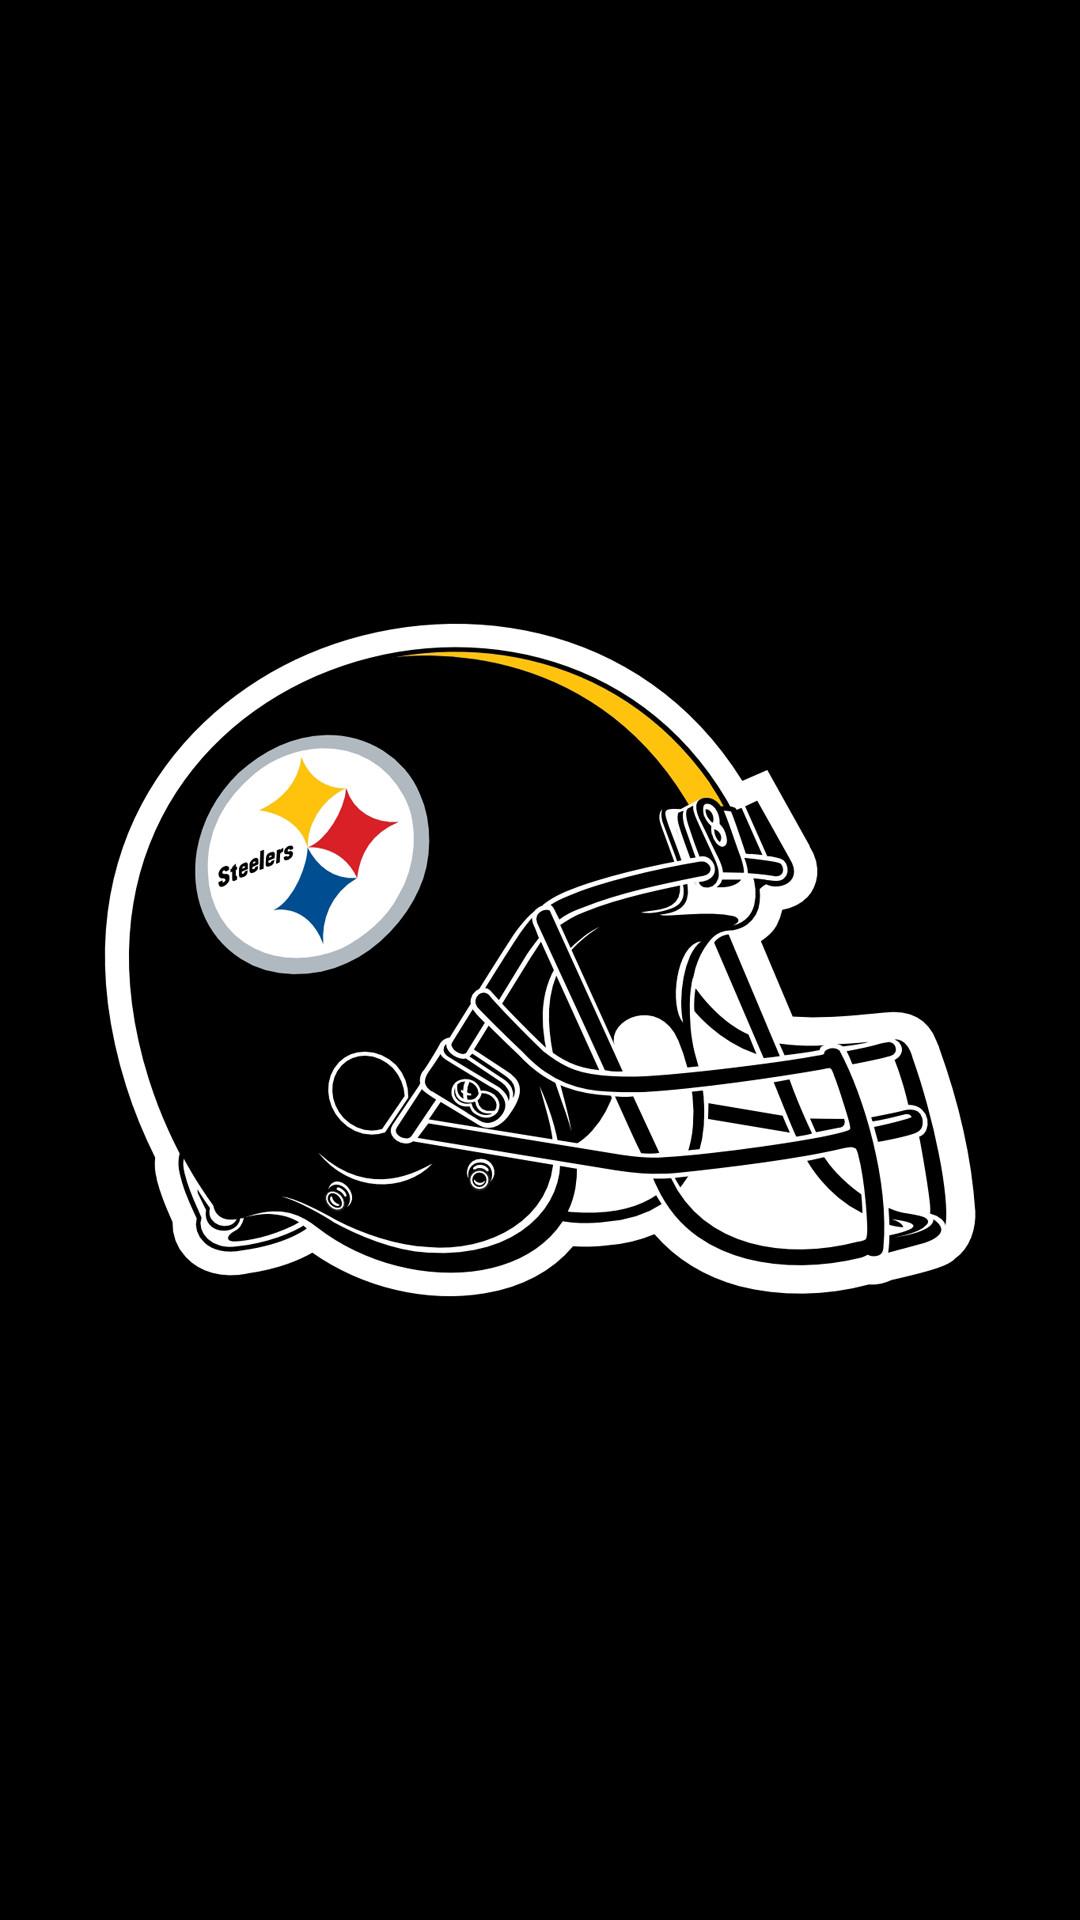 HD PC (Win10) Steelers Pics: NMgnCP.com